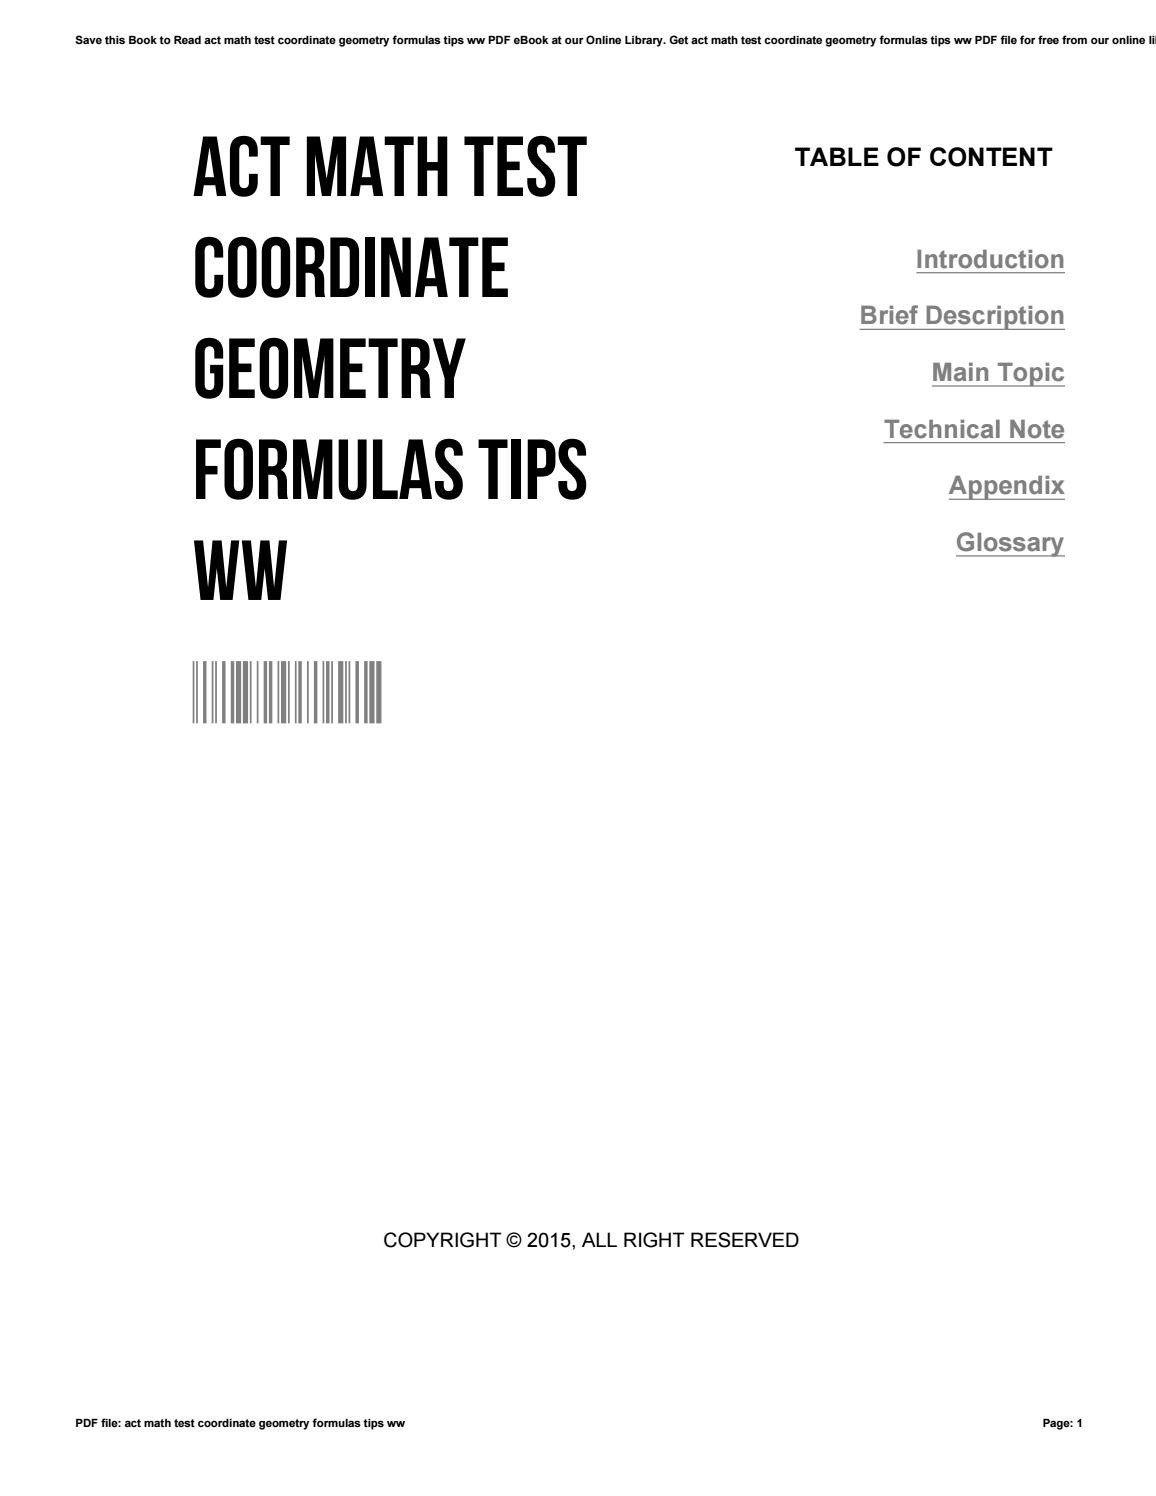 Act Prep Math Worksheets Pdf Act Math Tips Sneide Free Printable Math Worksheets Kindergarten Subtraction Worksheets Printable Math Worksheets